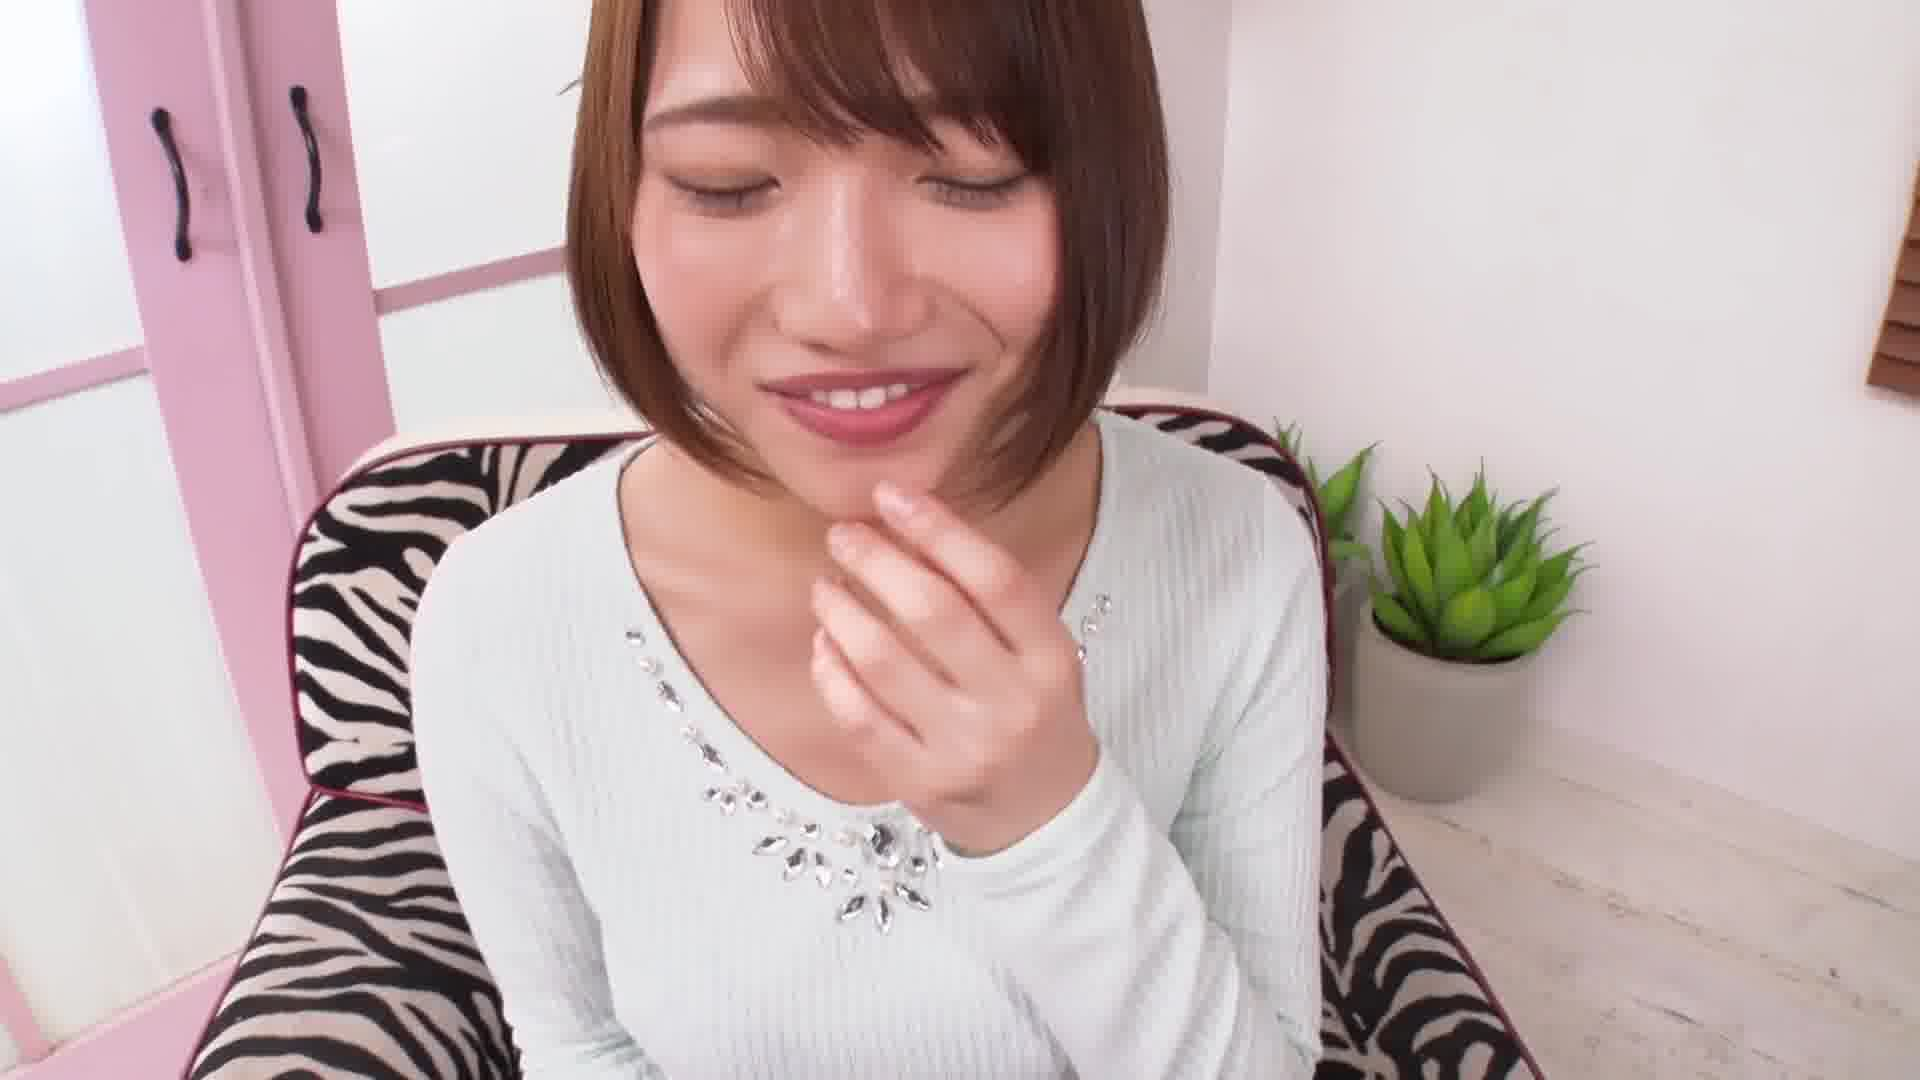 BOGA x BOGA ~菊川みつ葉が僕のプレイを褒め称えてくれる~ – 菊川みつ葉【巨乳・イラマチオ・そっくりさん】